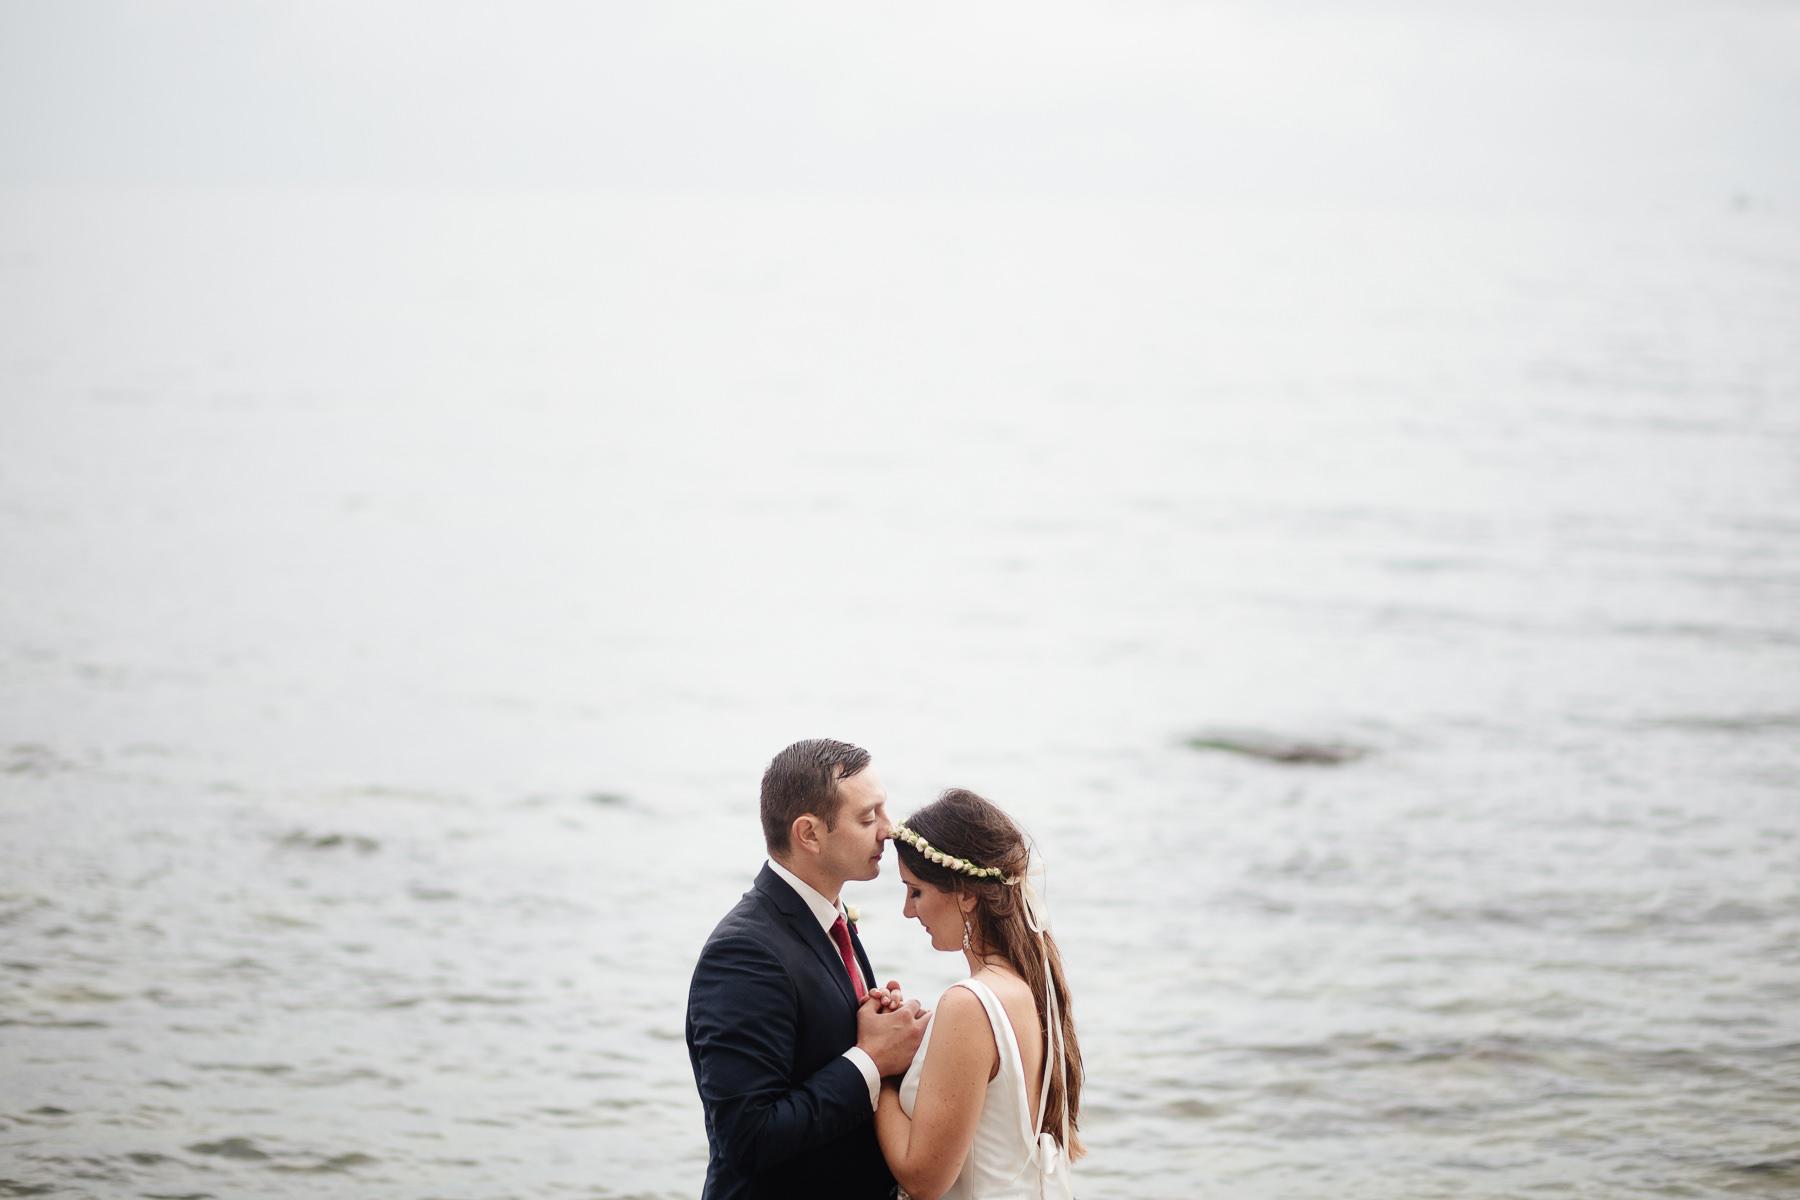 ślub nad bałtykiem